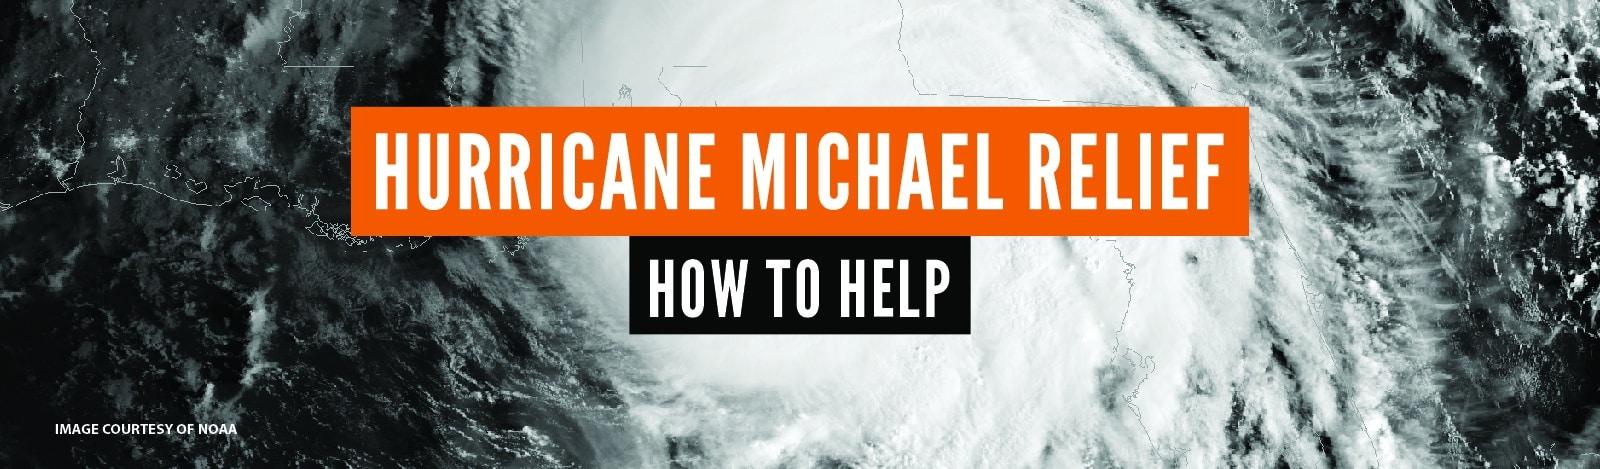 2018.10.12.HurricaneMichael.WebsiteBanner-01